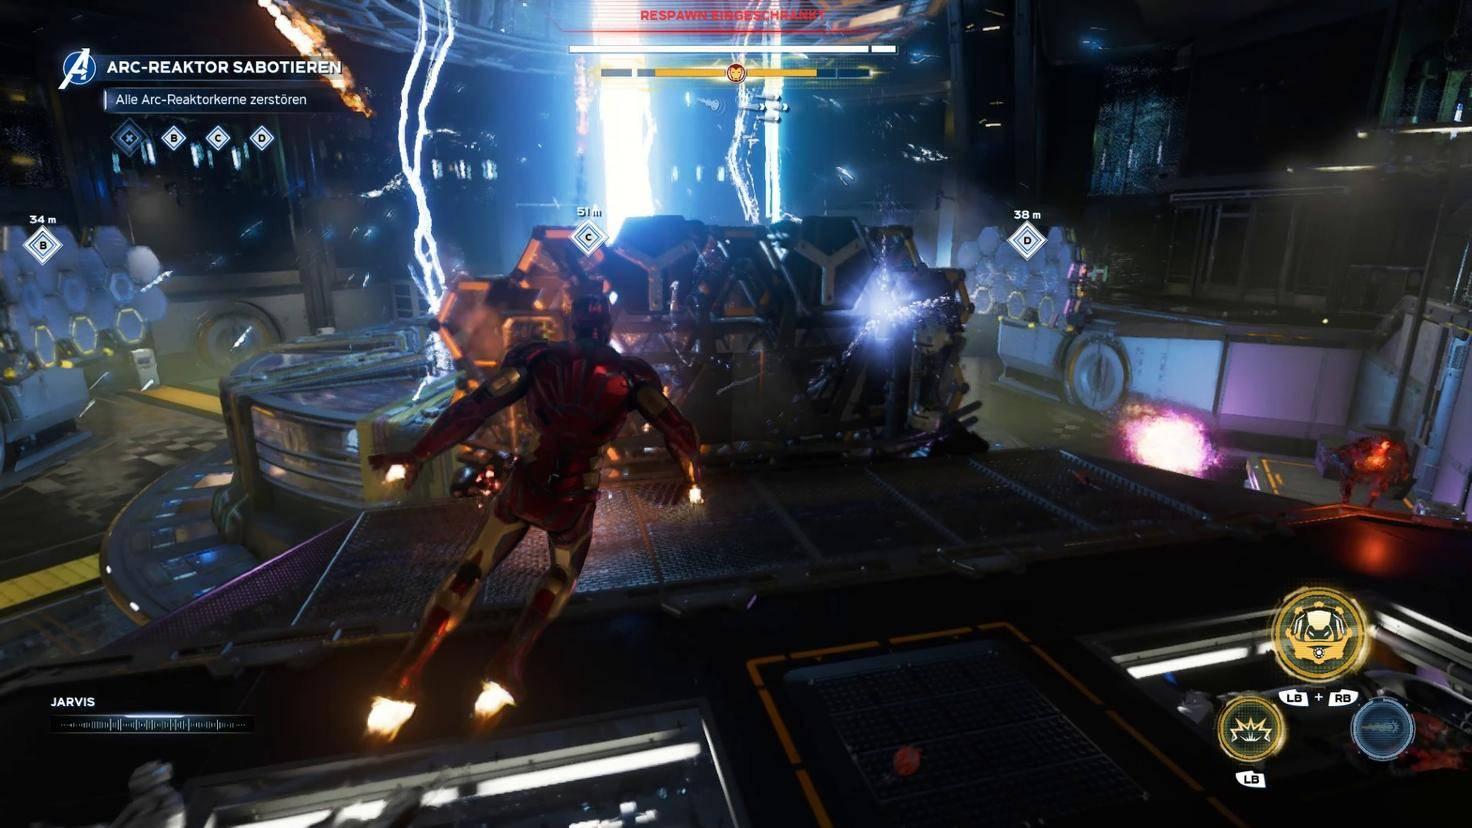 merveilles-avengers-iron-man-capture d'écran